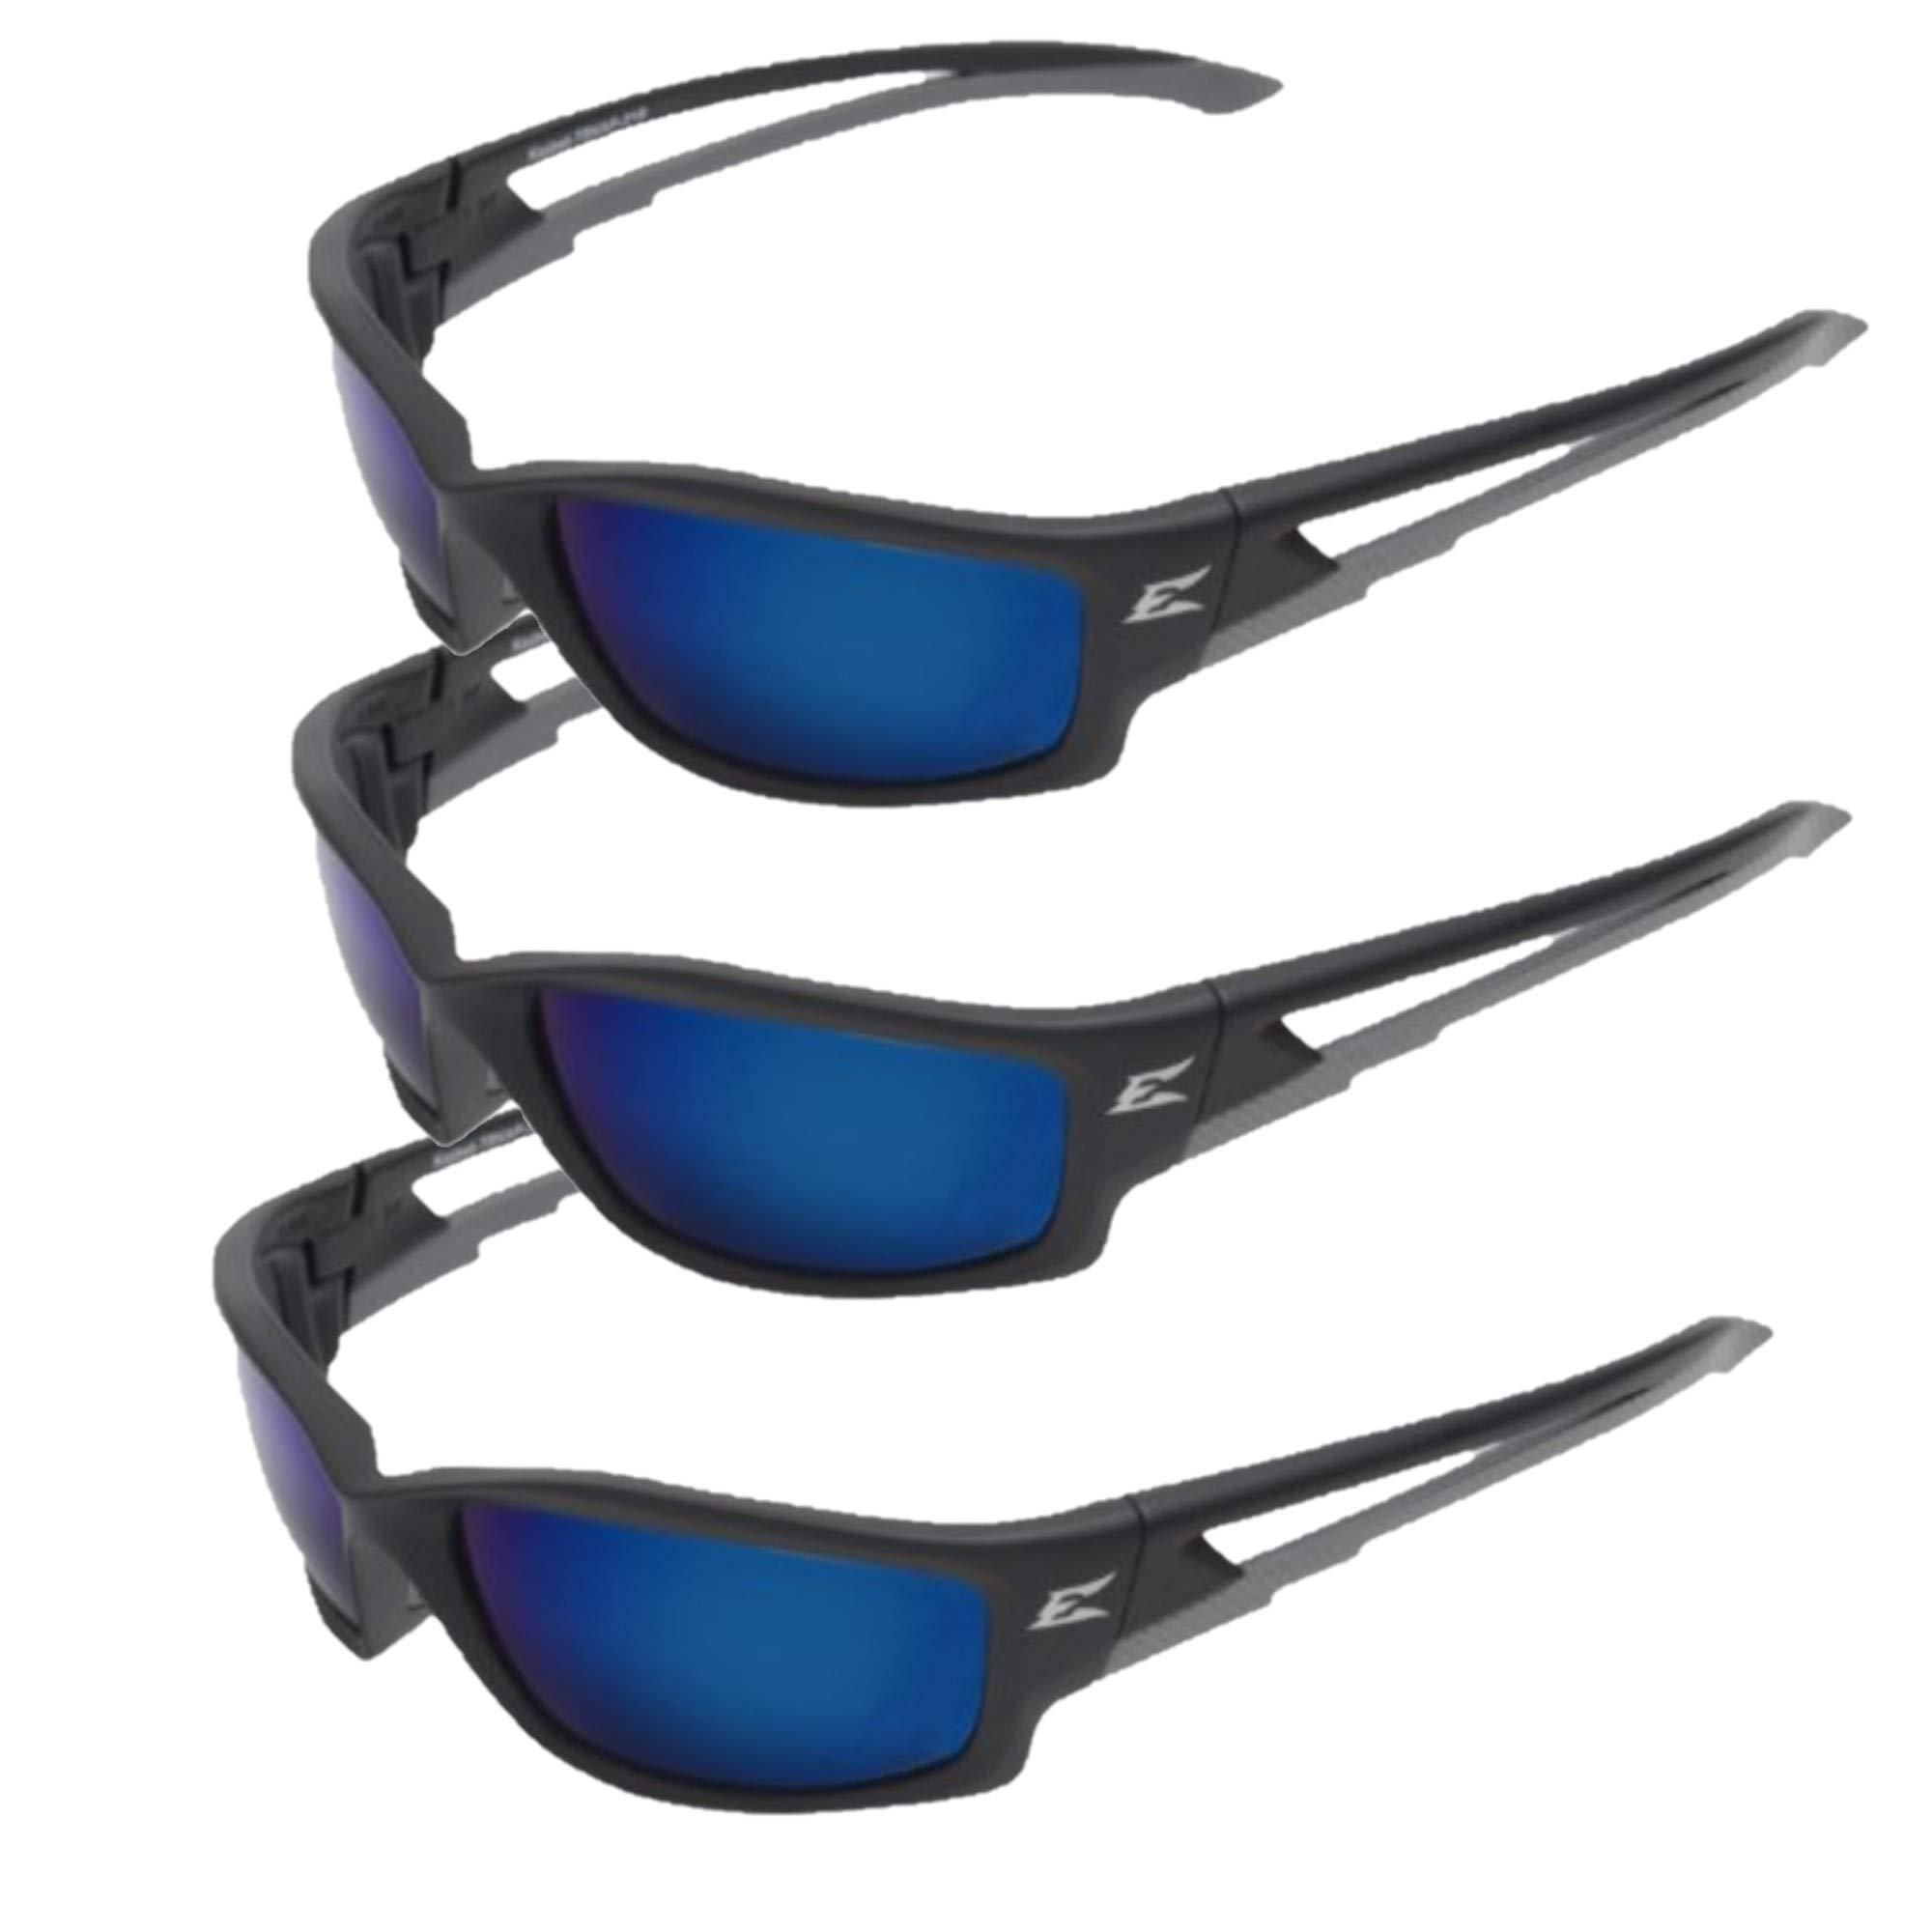 Edge Eyewear TSKAP218 Kazbek Polarized Safety Glasses, Black with Aqua Precision Blue Mirror Lens (3)